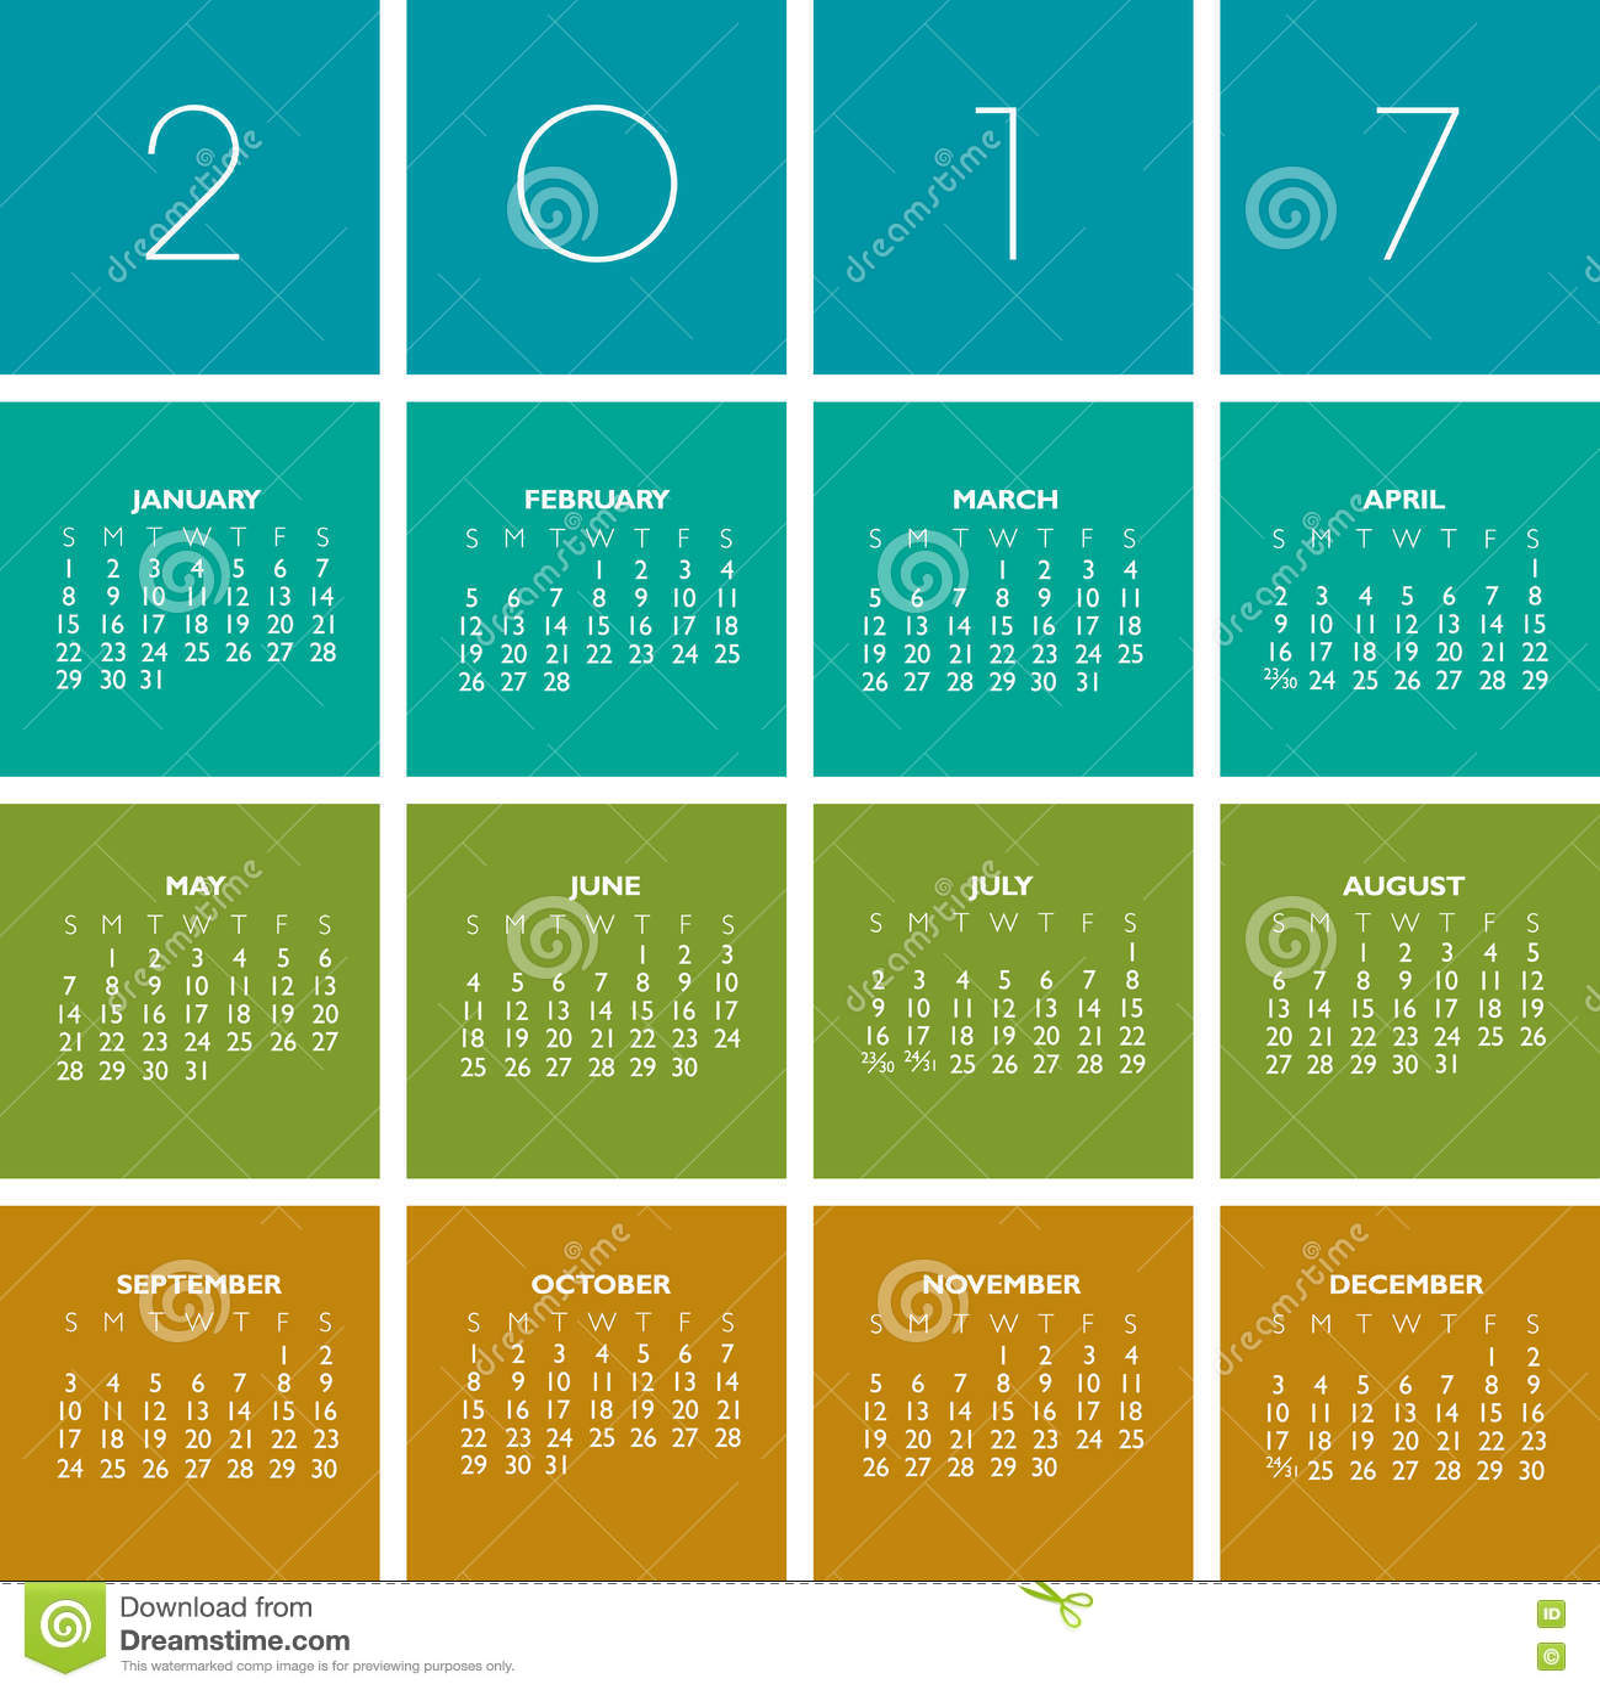 Set Up A Calendar Year Is Momentjs Docs 2017 Creative Colorful Calendar Stock Vector Image 71171255